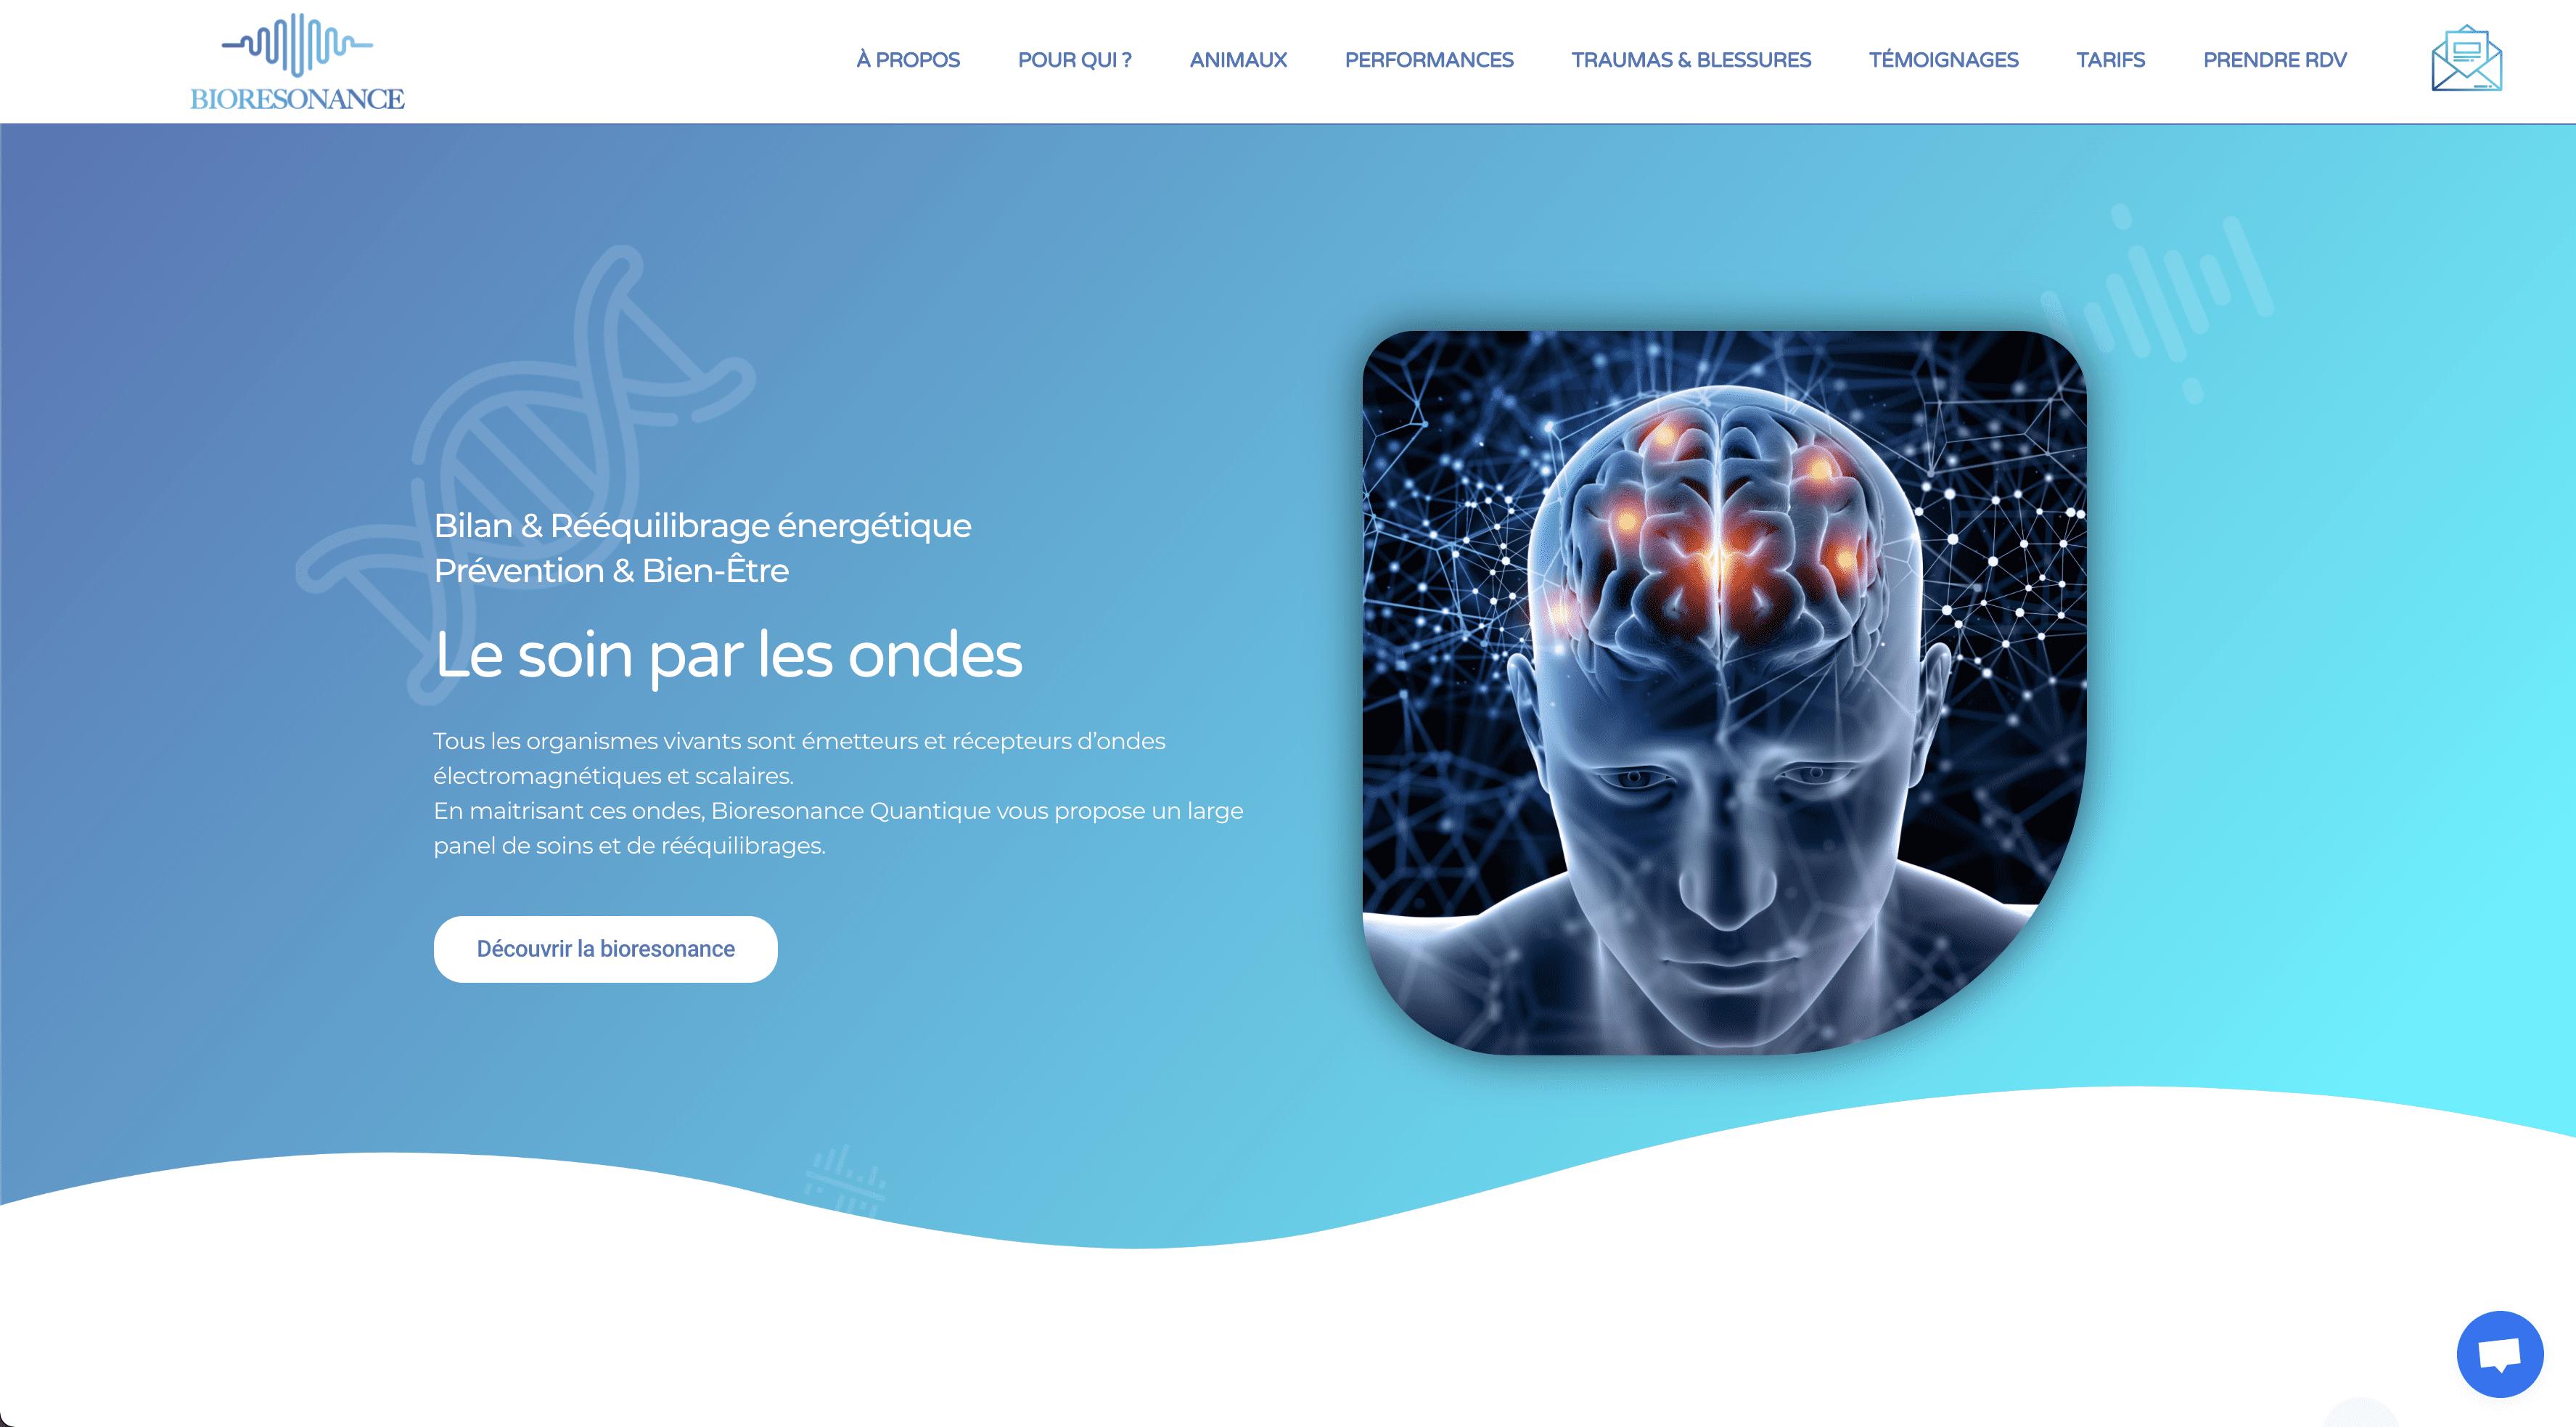 Bioresonance Quantique Agence Artwork Votre Agence de Communication Digitale